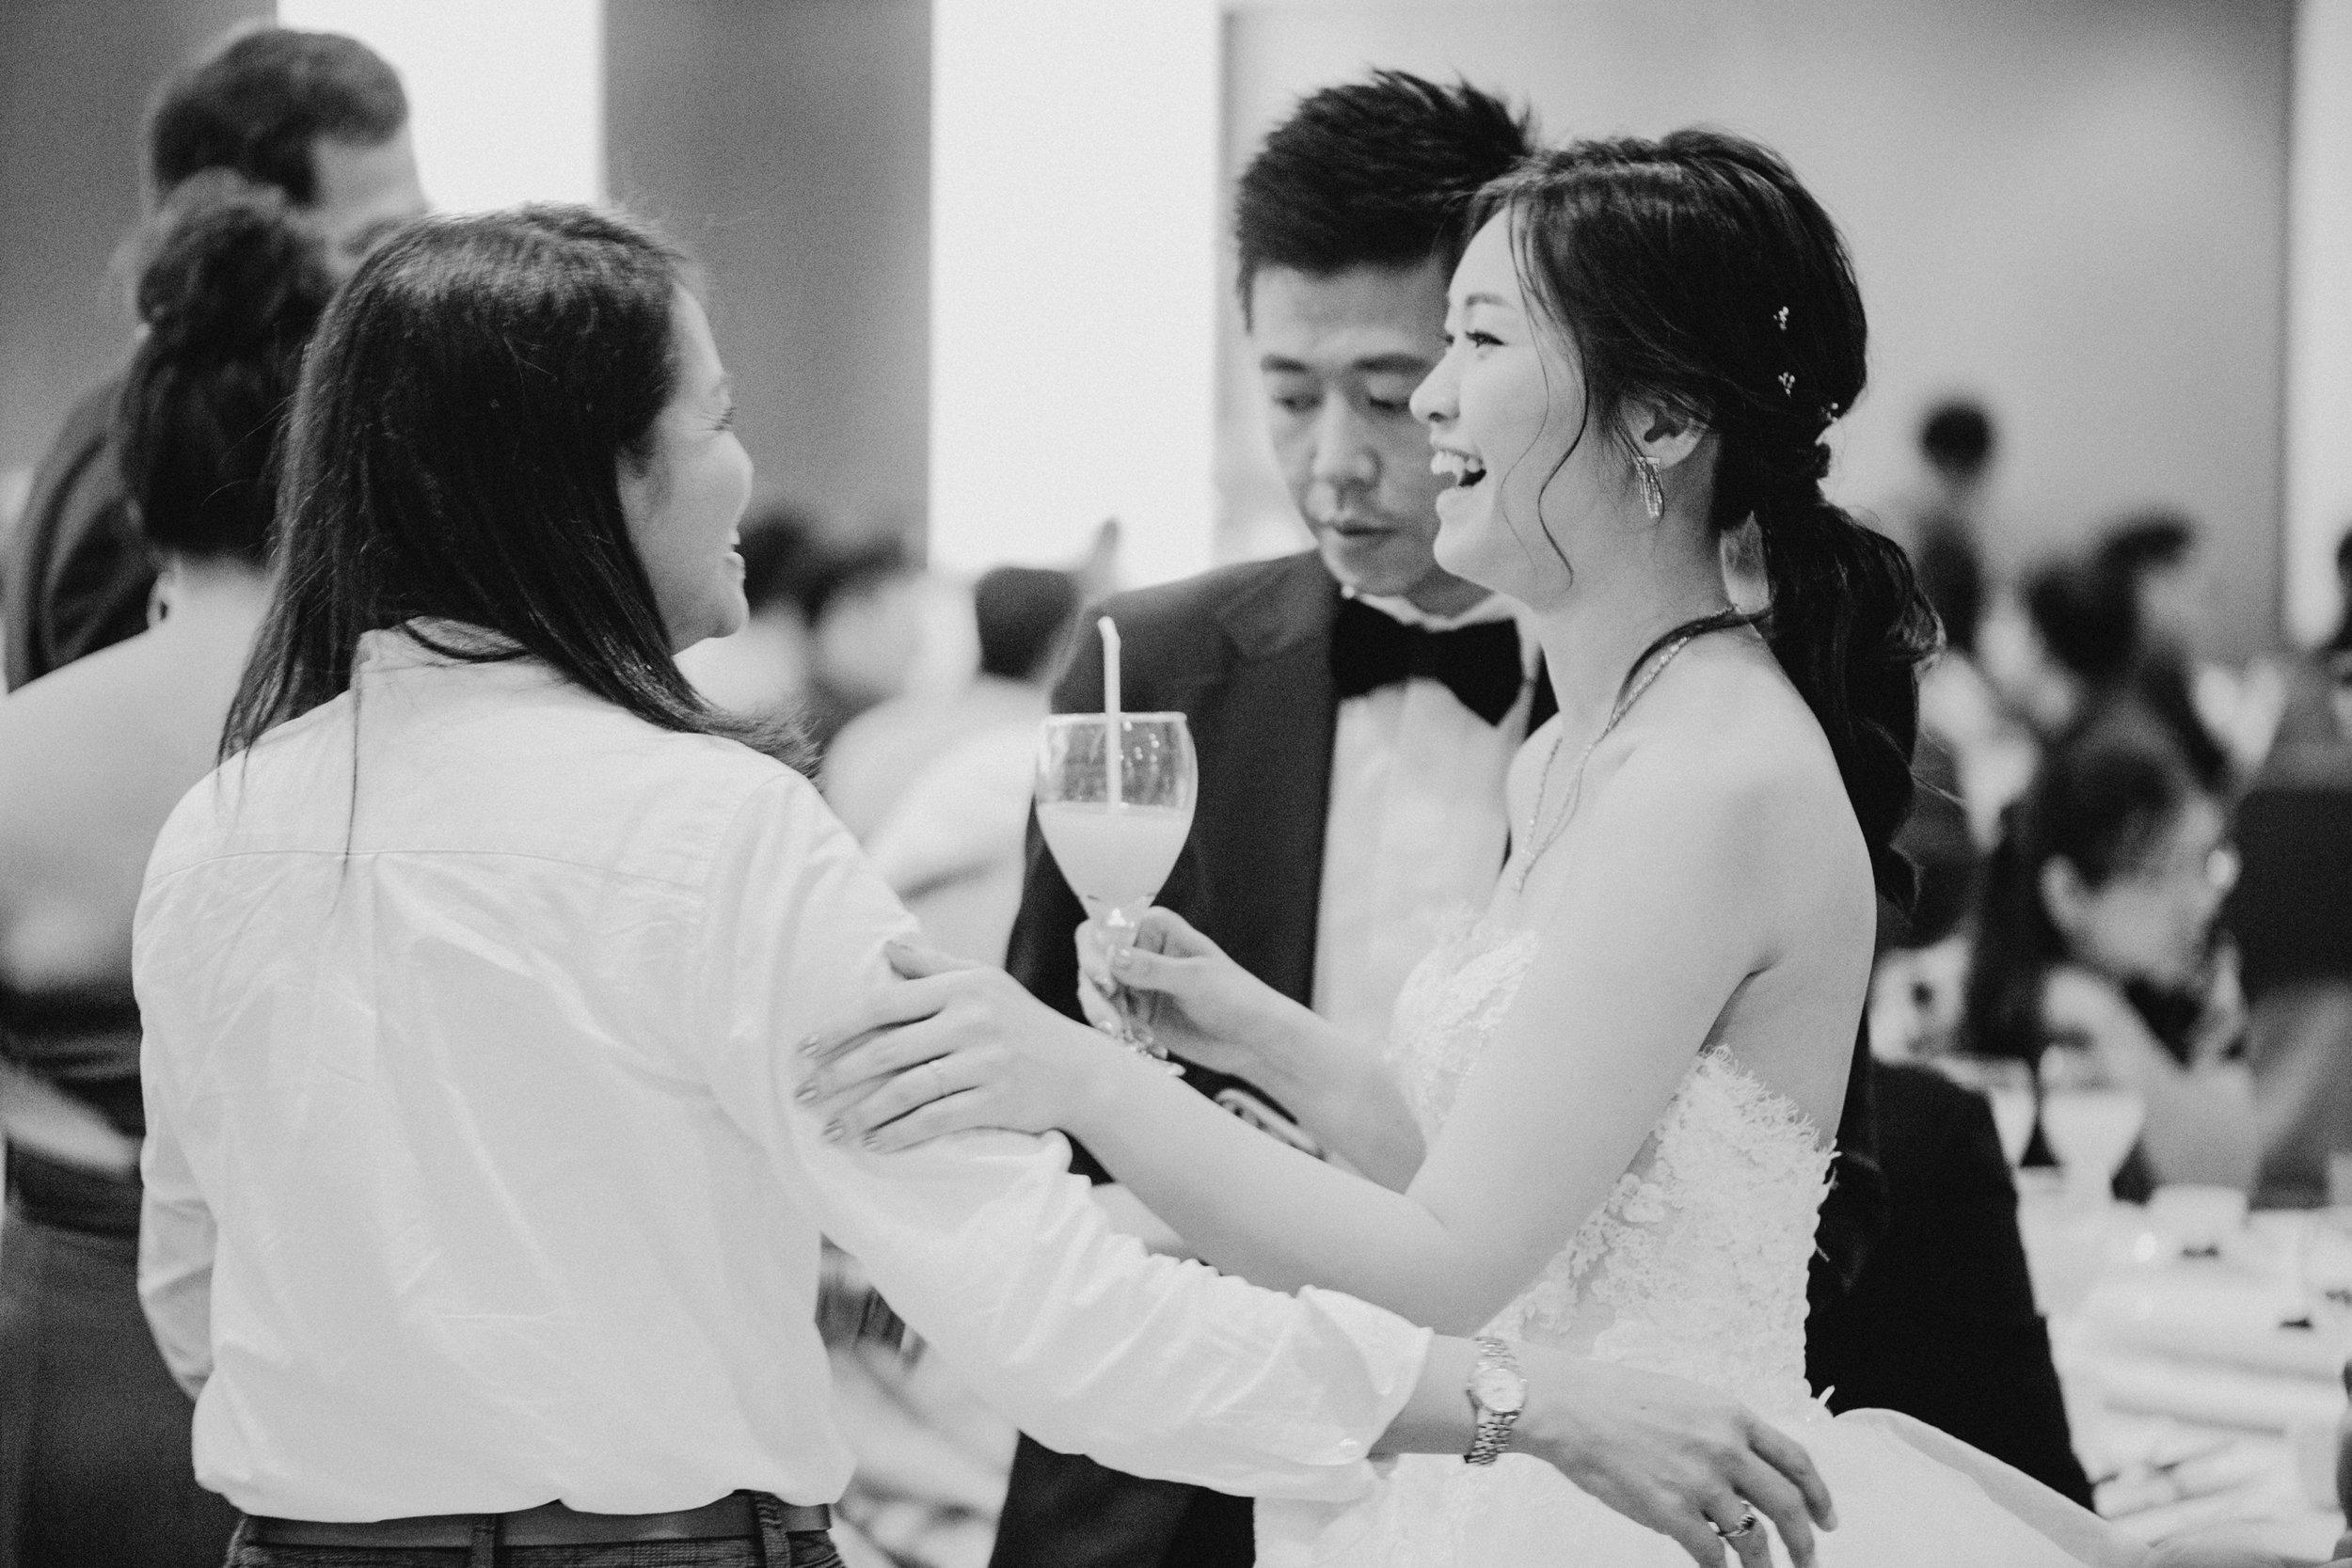 wedding-caridee-oscar-lunch-ambassador-hsinchu-結婚午宴-新竹國賓_134.jpg